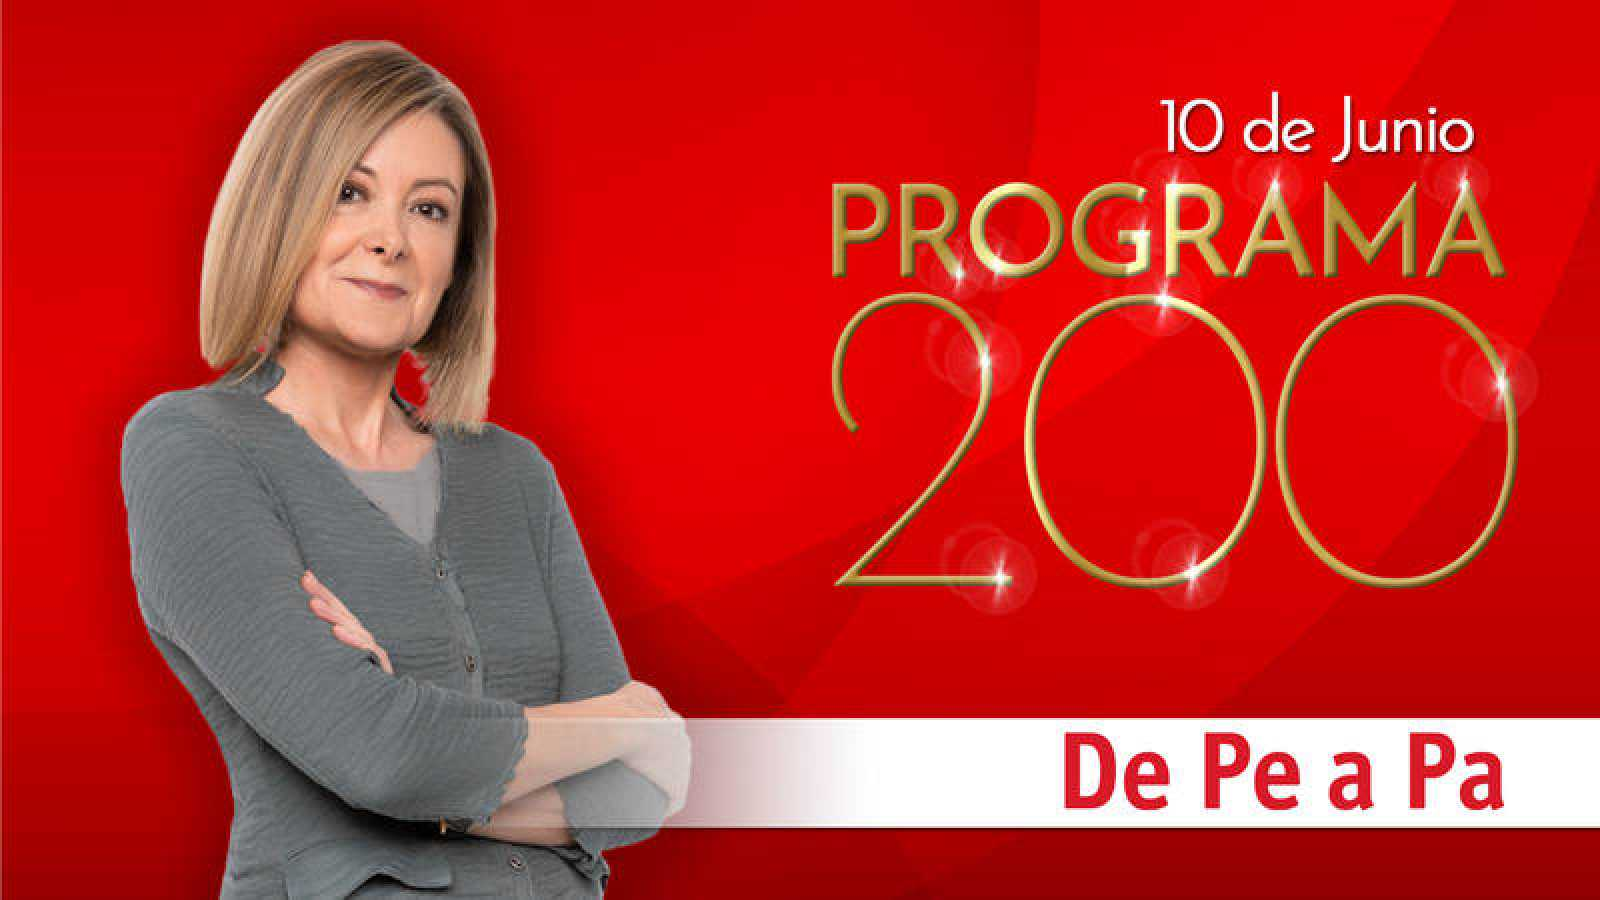 'De pe a pa' con Pepa Fernández